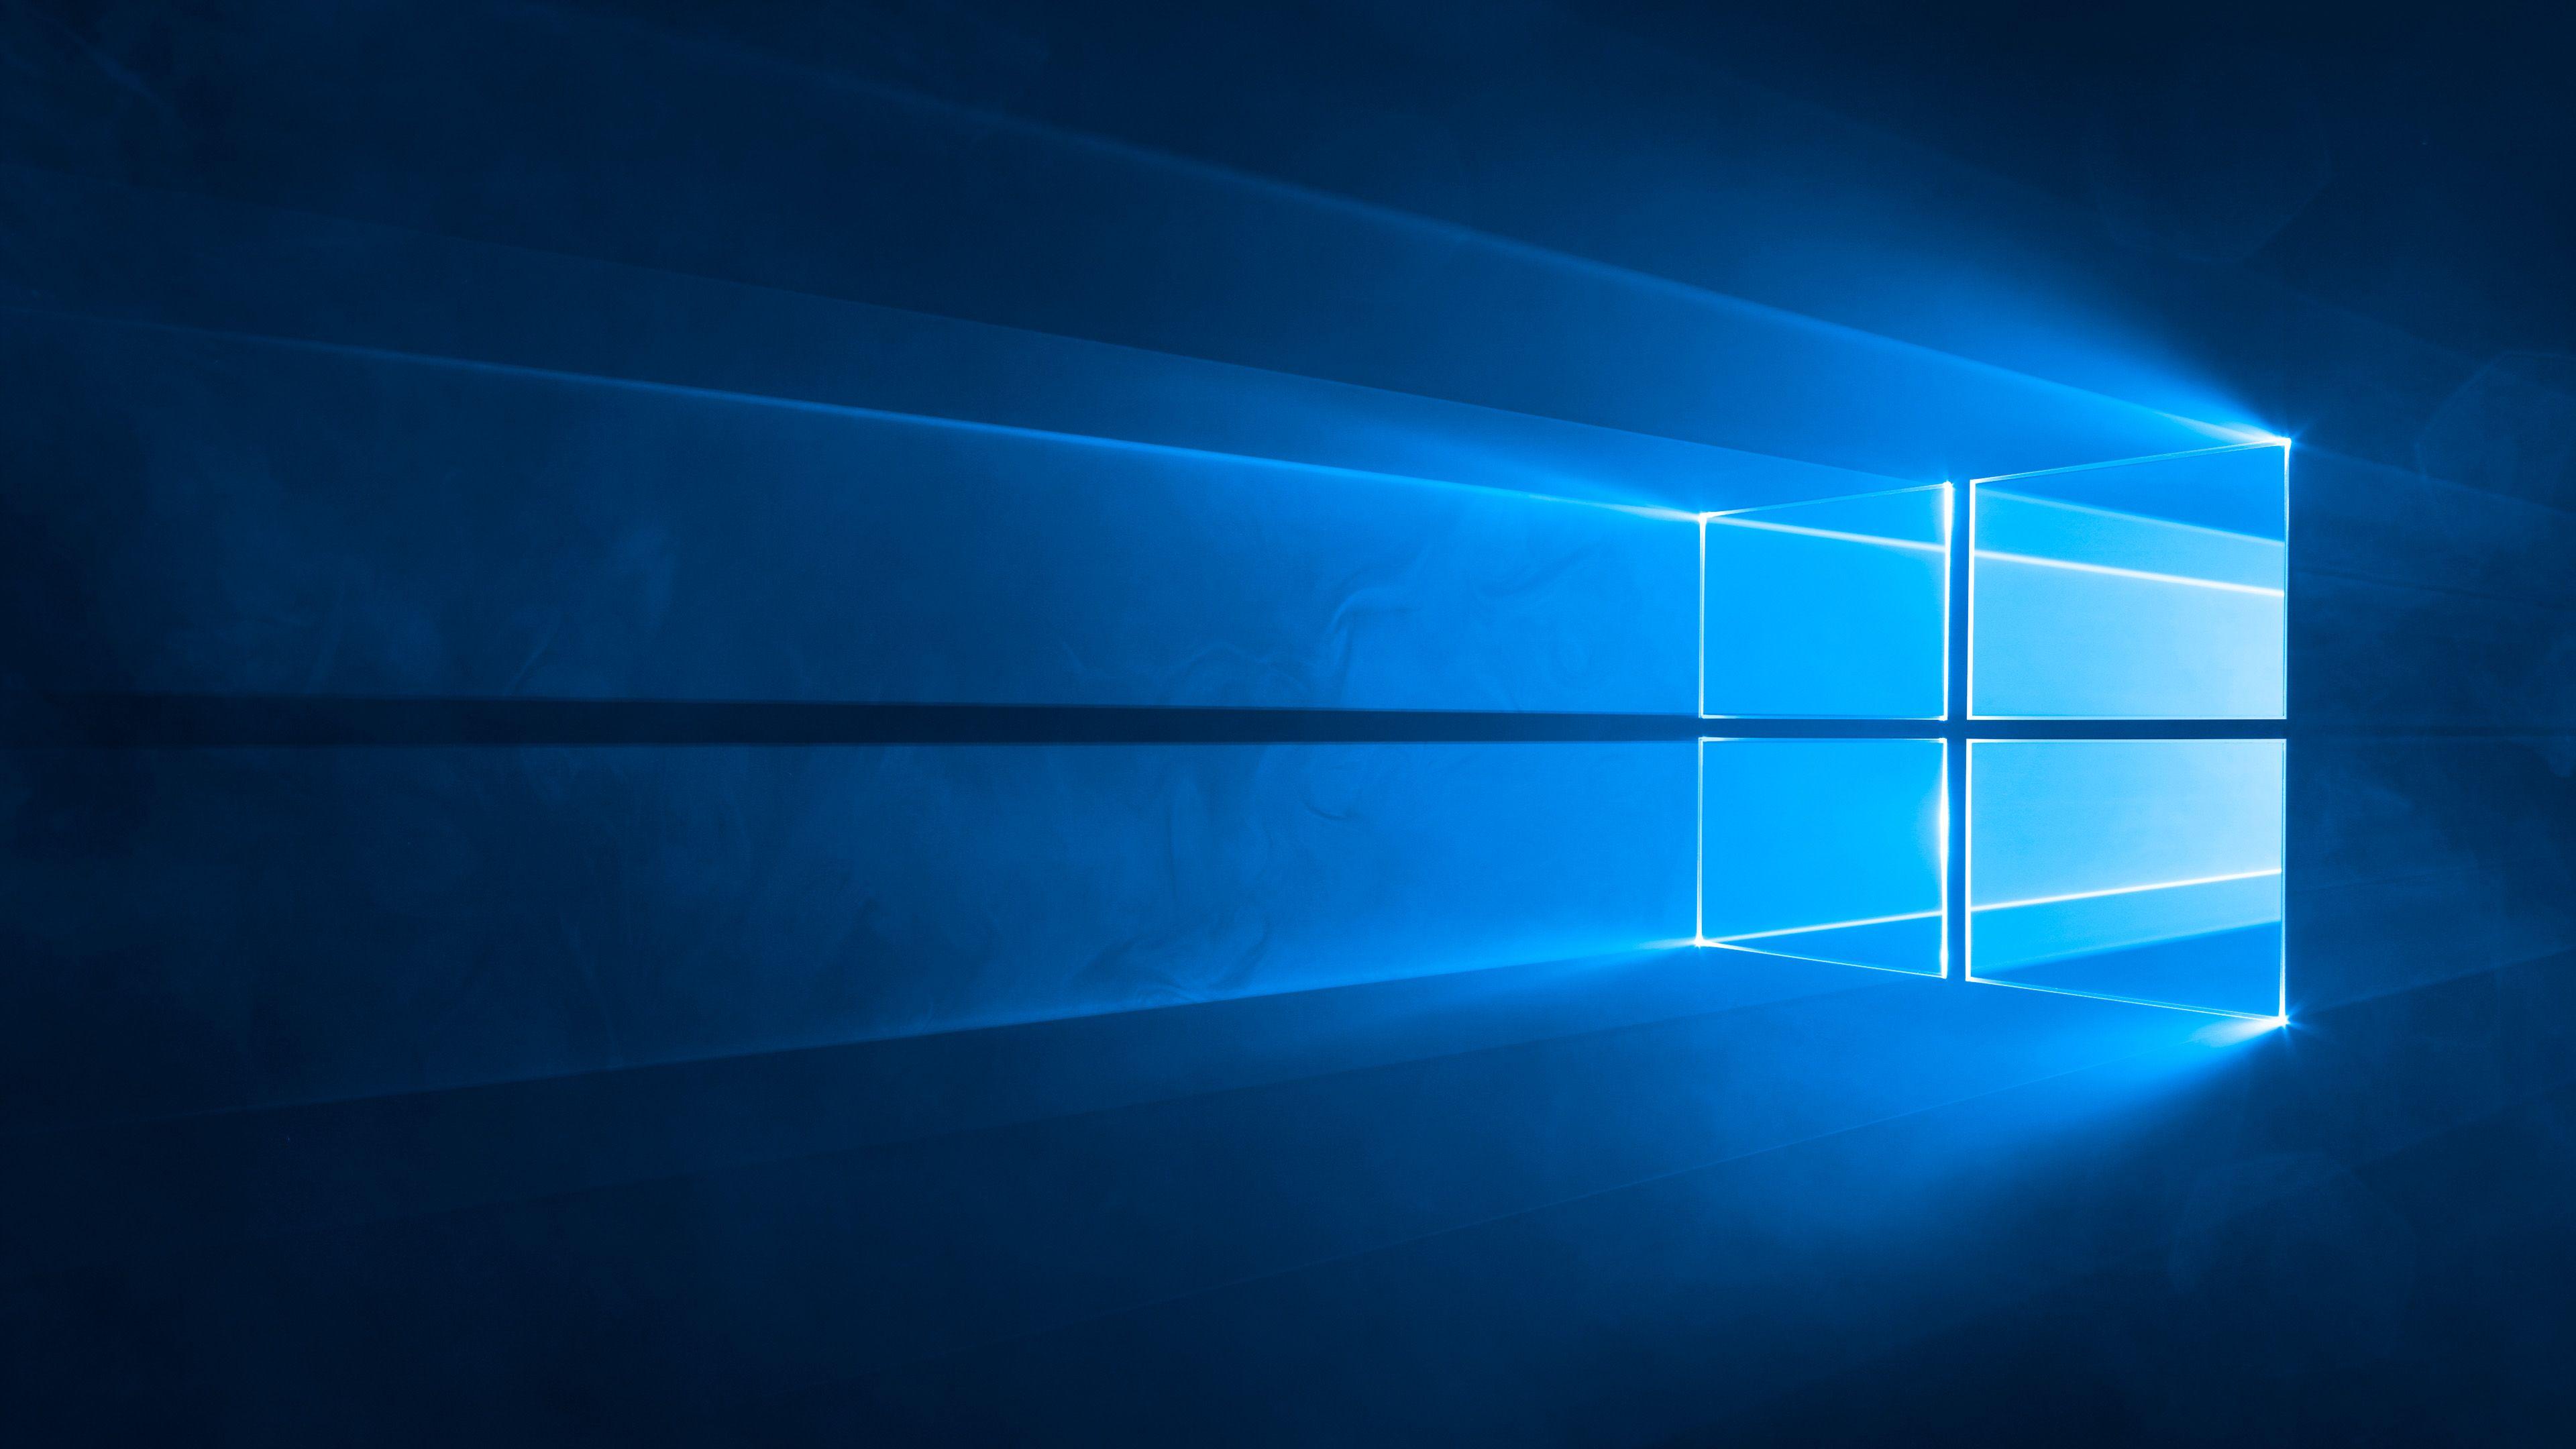 Windows 10 Backgroaund Of Desktop Wallpaper Windows 10 Windows